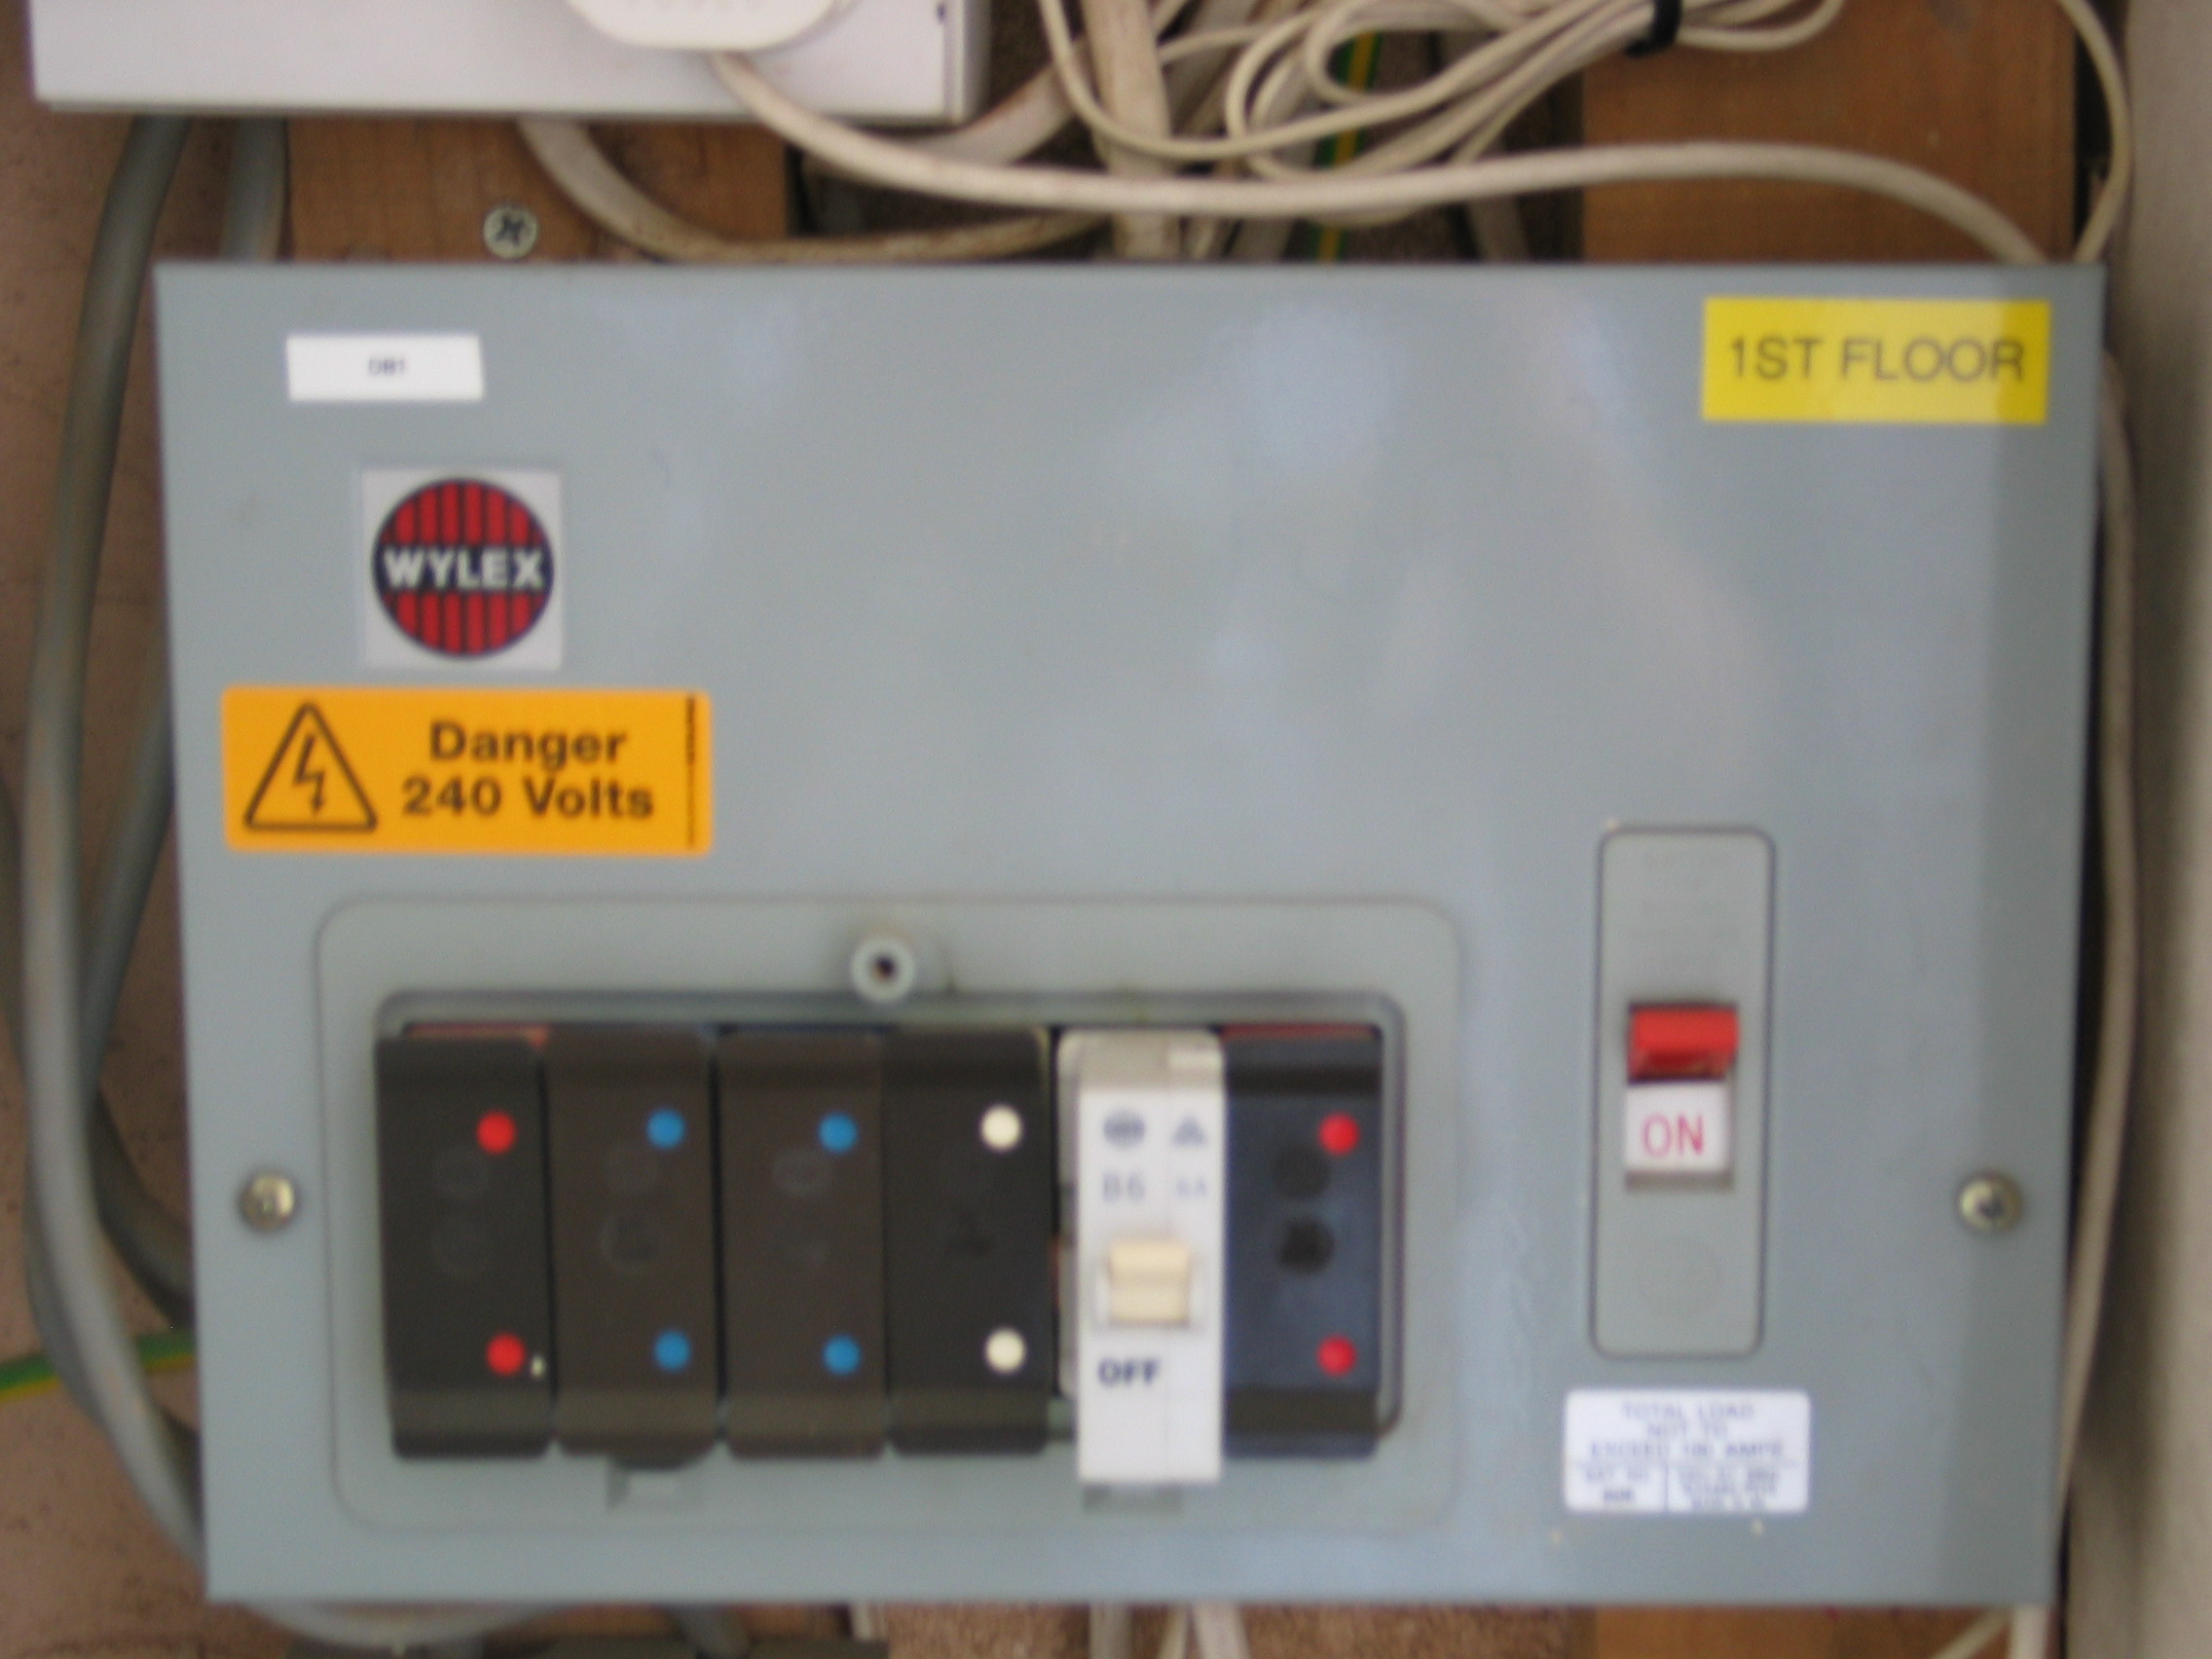 rcbo consumer unit wiring diagram 2007 kawasaki brute force 750 fuse board upgrades and rcd protection north london